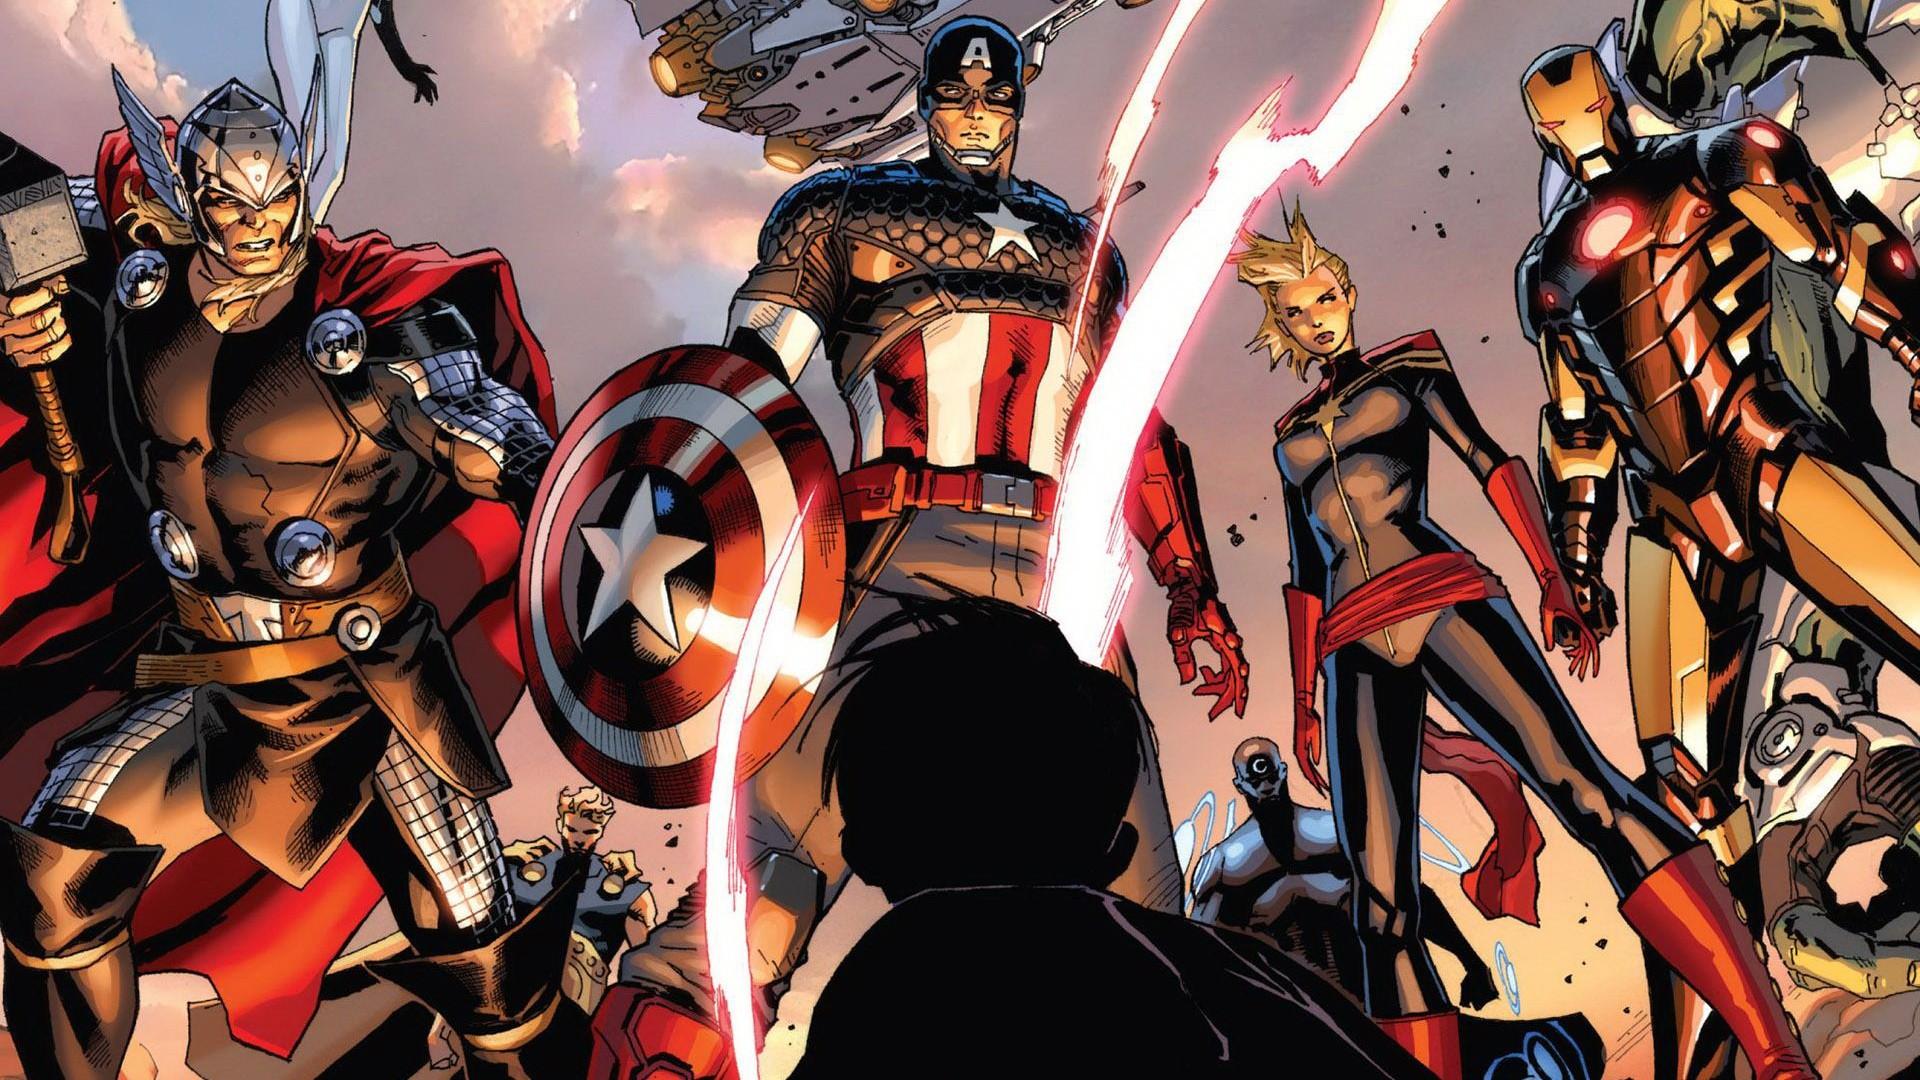 12 best images about <b>marvel avengers comic</b> on Pinterest | Dc ...